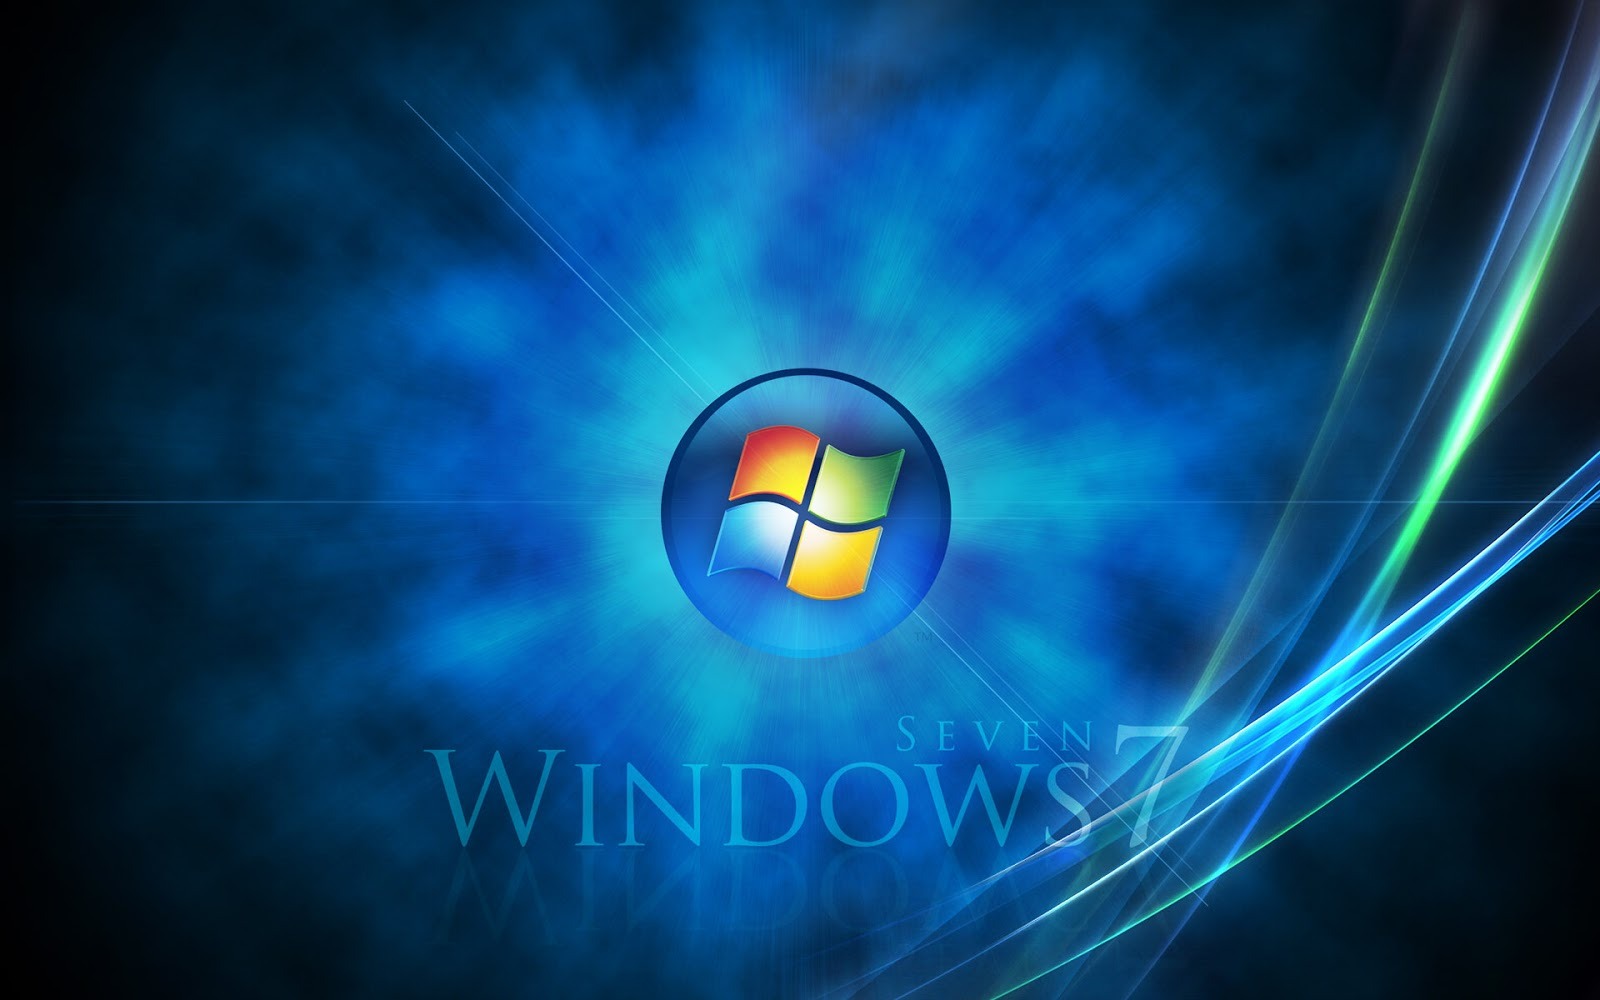 Wallpaper windows 7 full hd - Download Wallpaper win 7   Wallpaper Full HD Wide   Wallpaperhd360